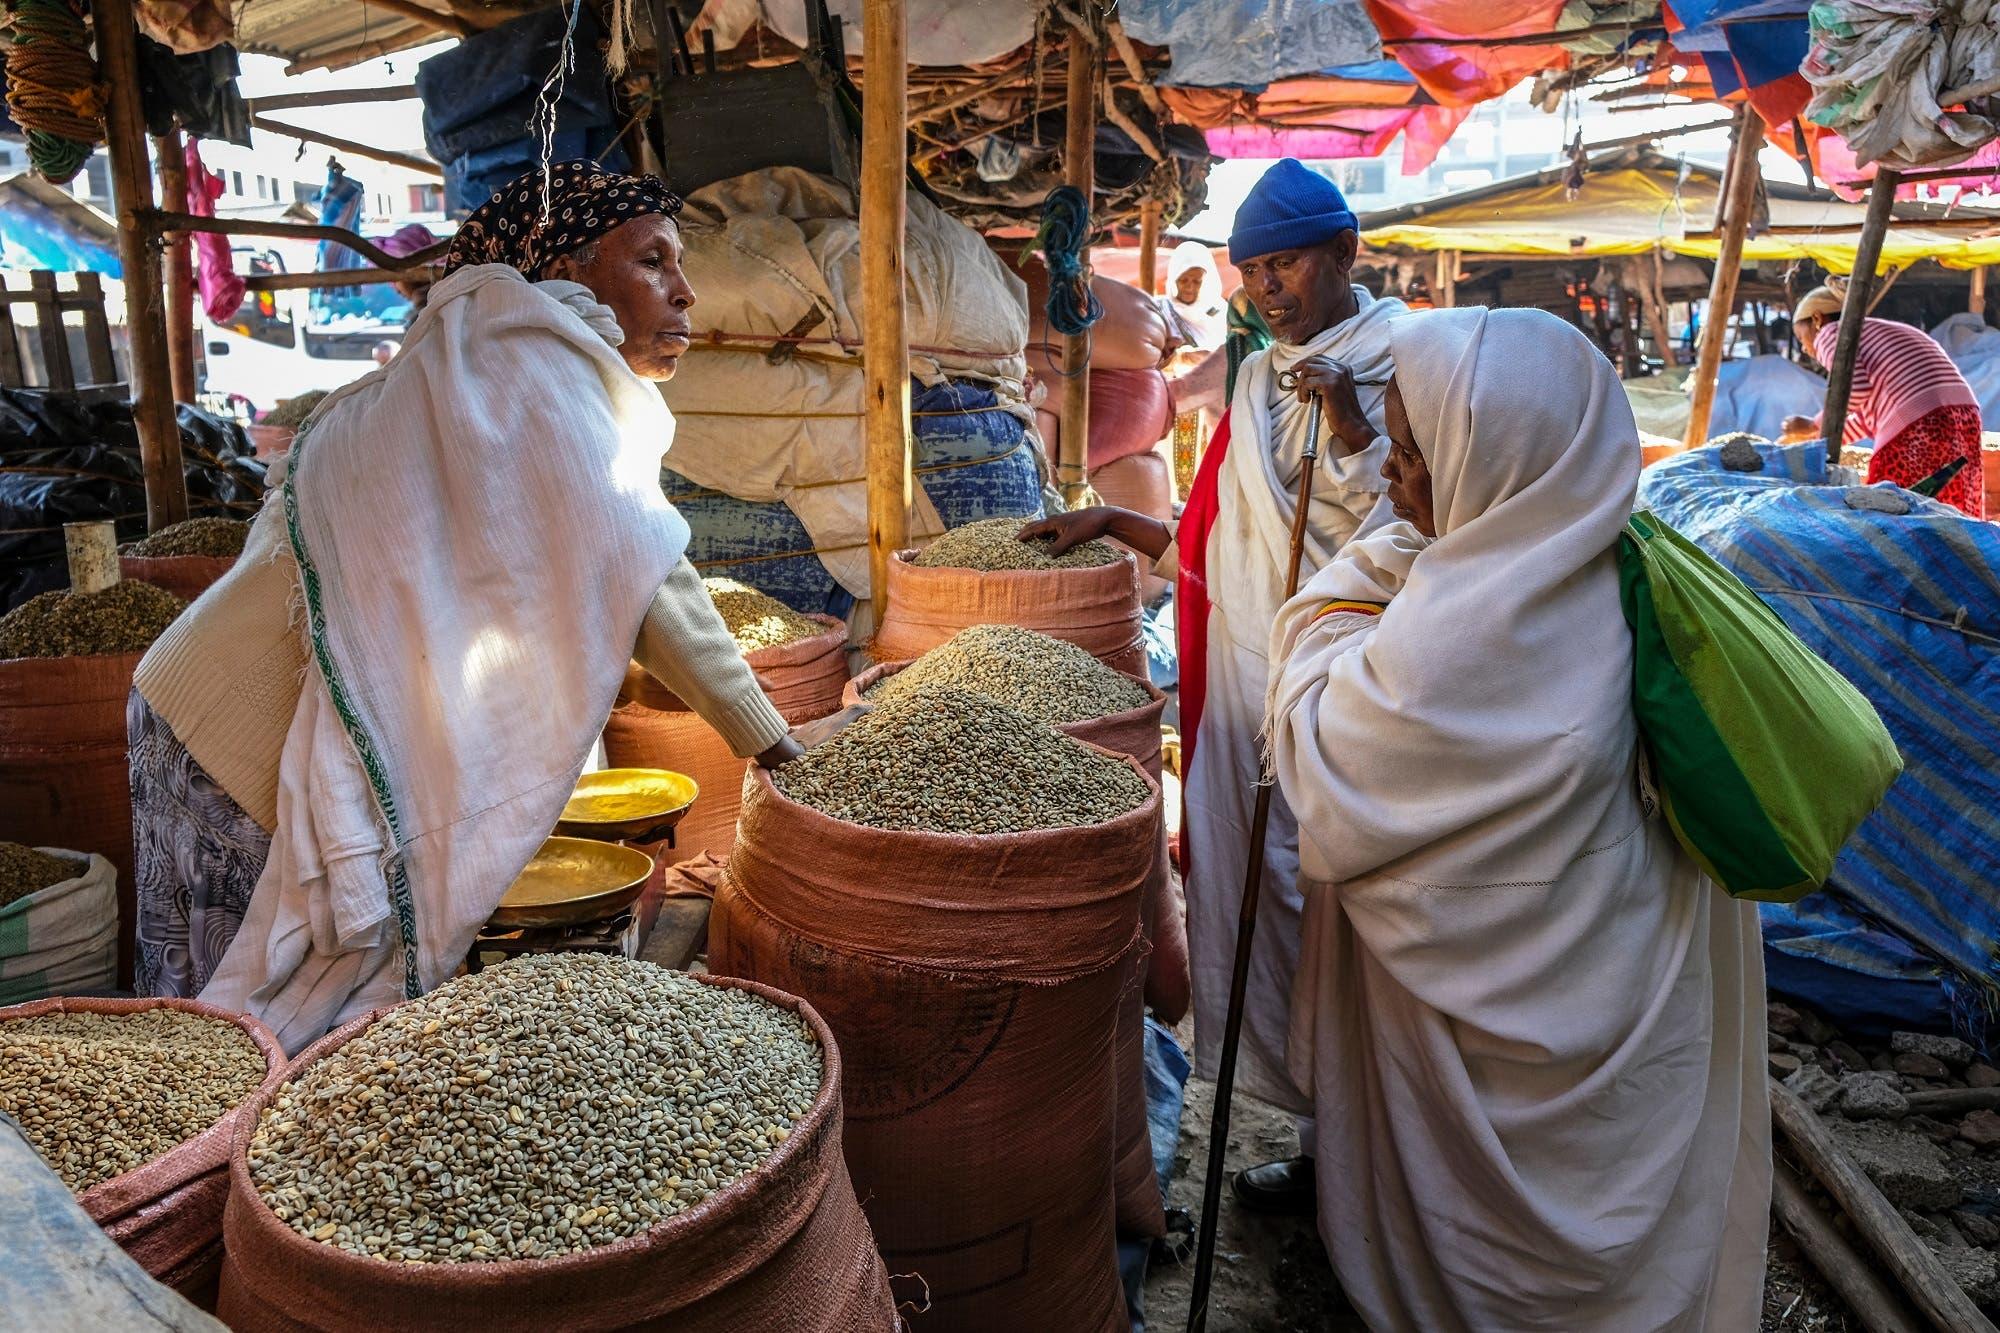 Ethiopian woman sells coffee beans. (File photo: Shutterstock)